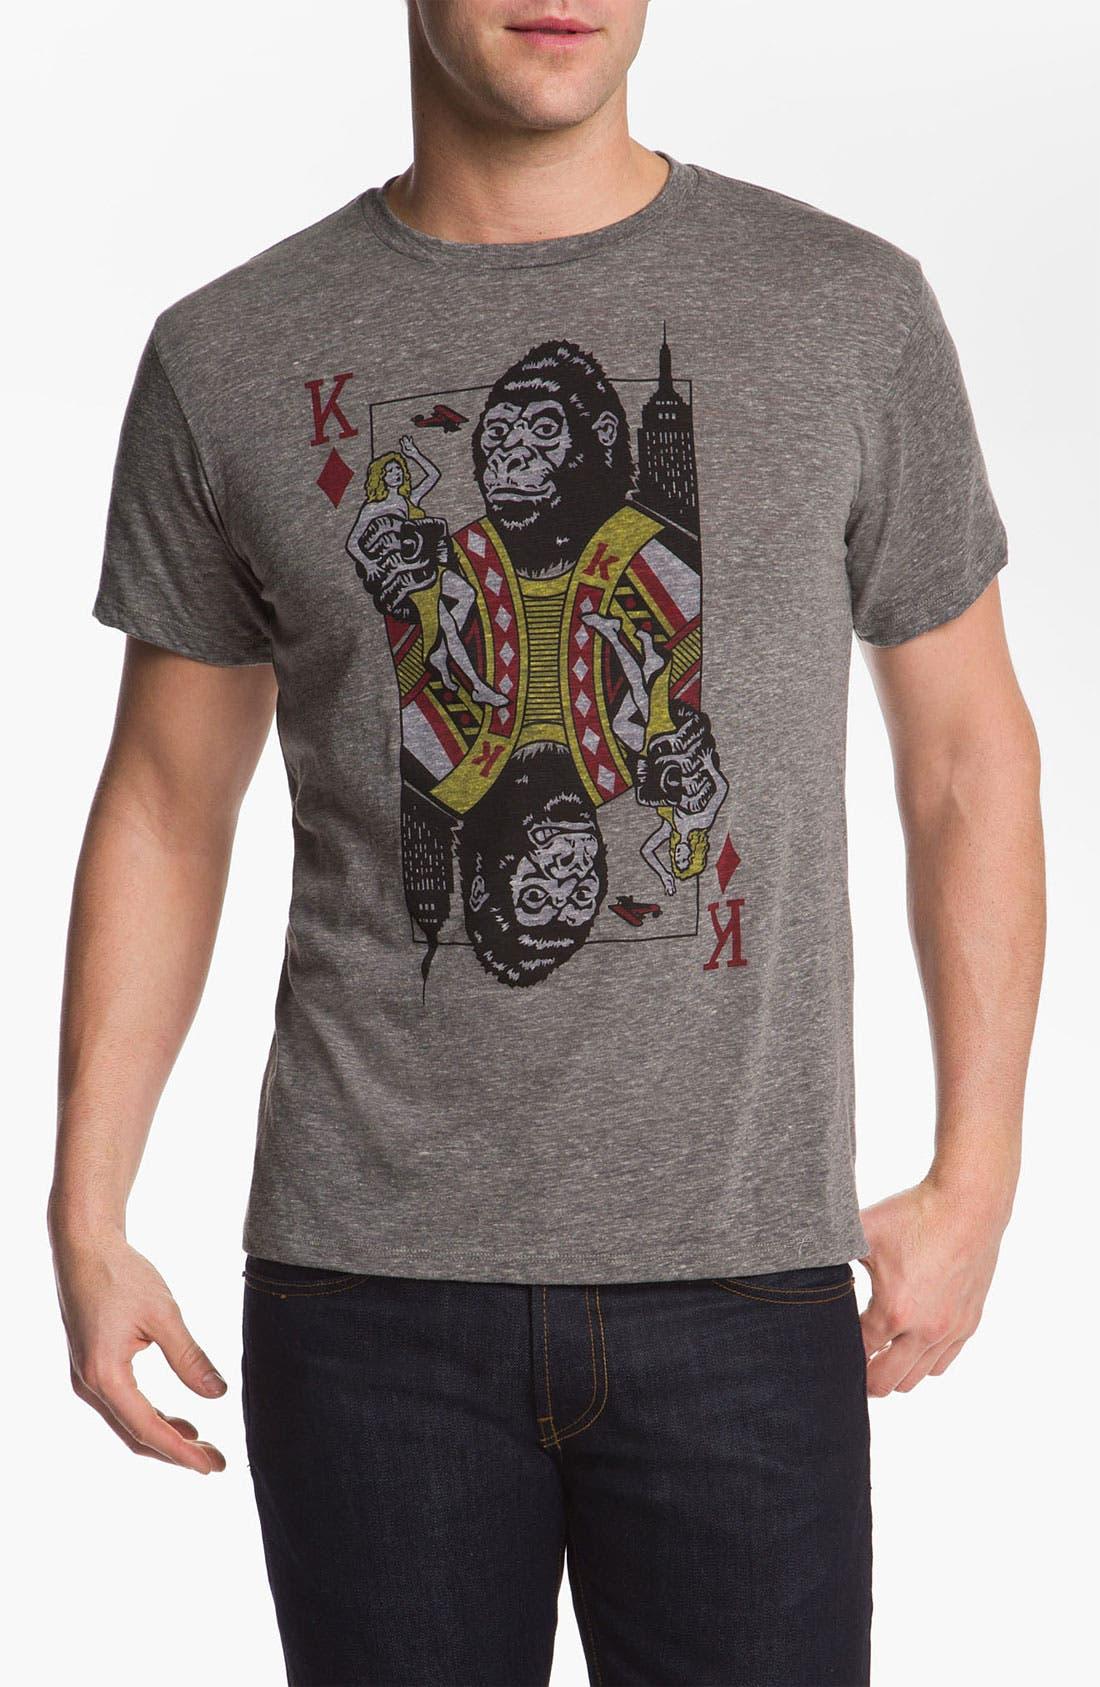 Alternate Image 1 Selected - Headline Shirts 'King' Graphic T-Shirt